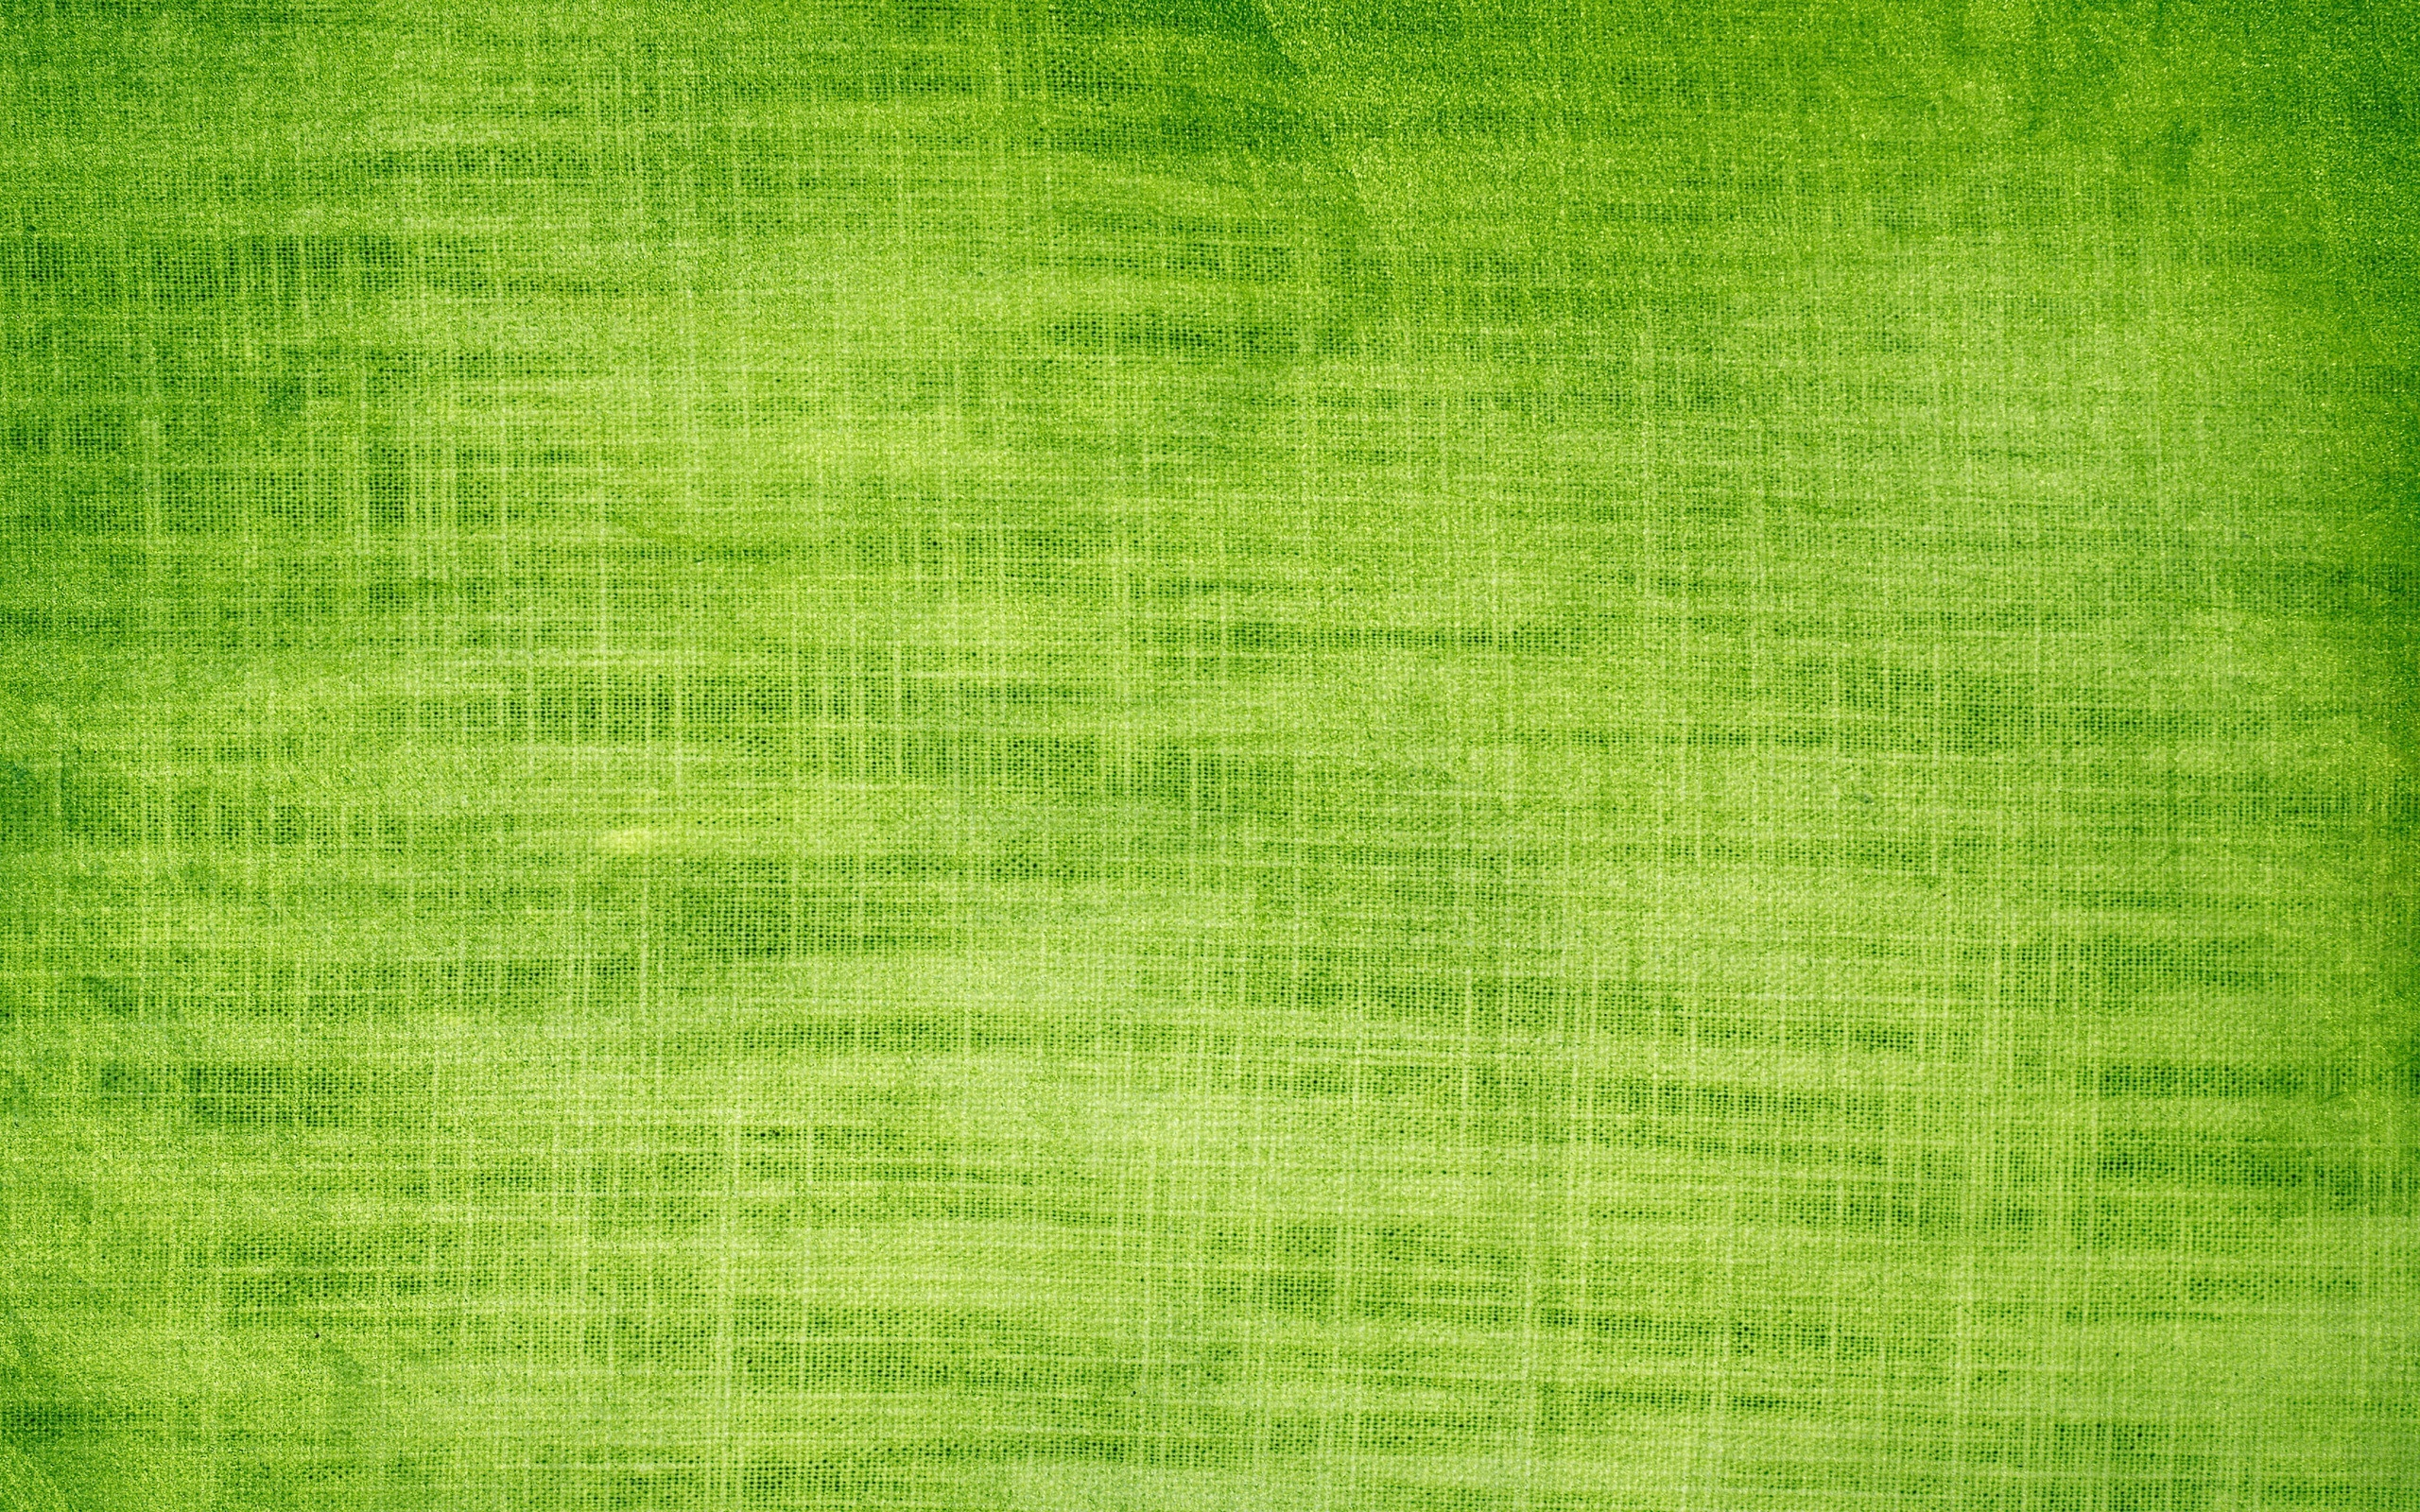 Bright Green Background HD 6880 Wallpaper Cool Walldiskpapercom 2560x1600